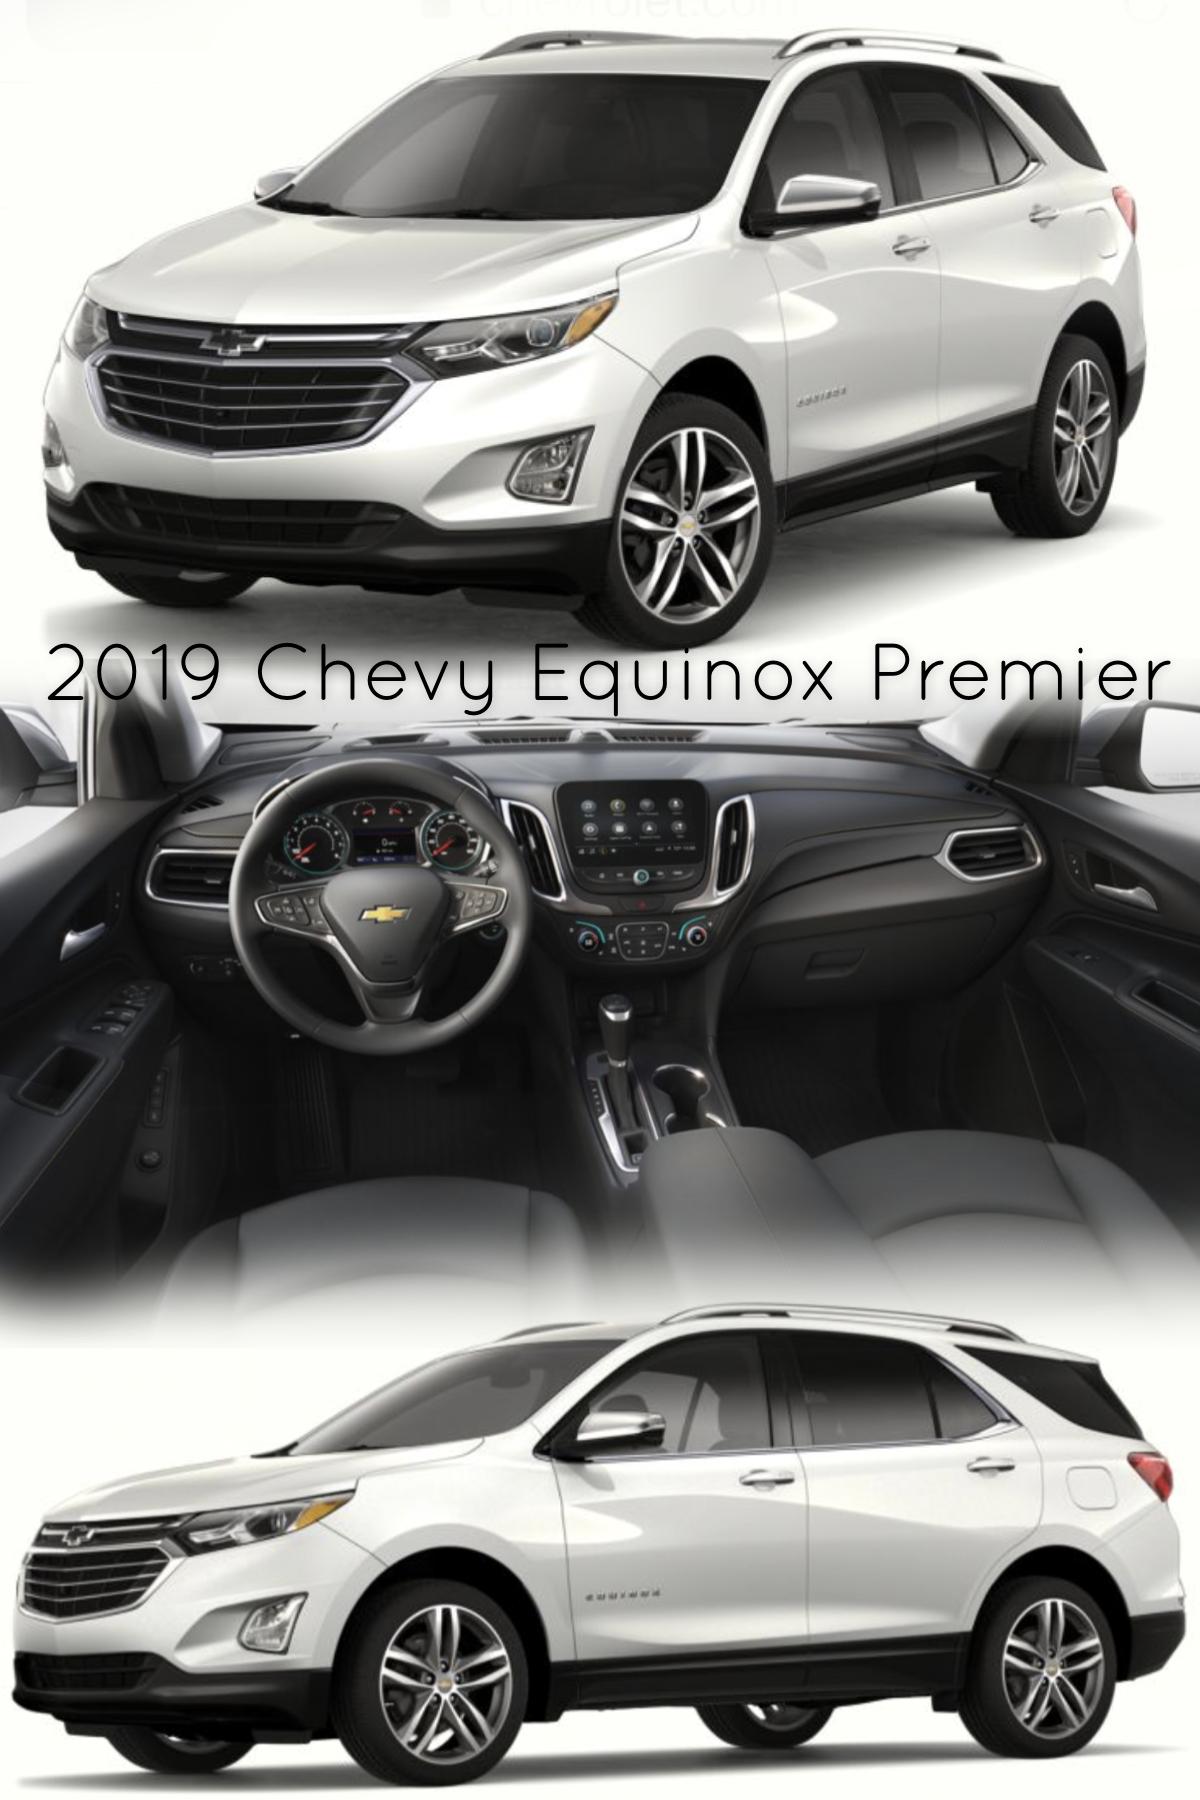 2019 Chevy Equinox Premier Chevy Equinox Chevy Equinox